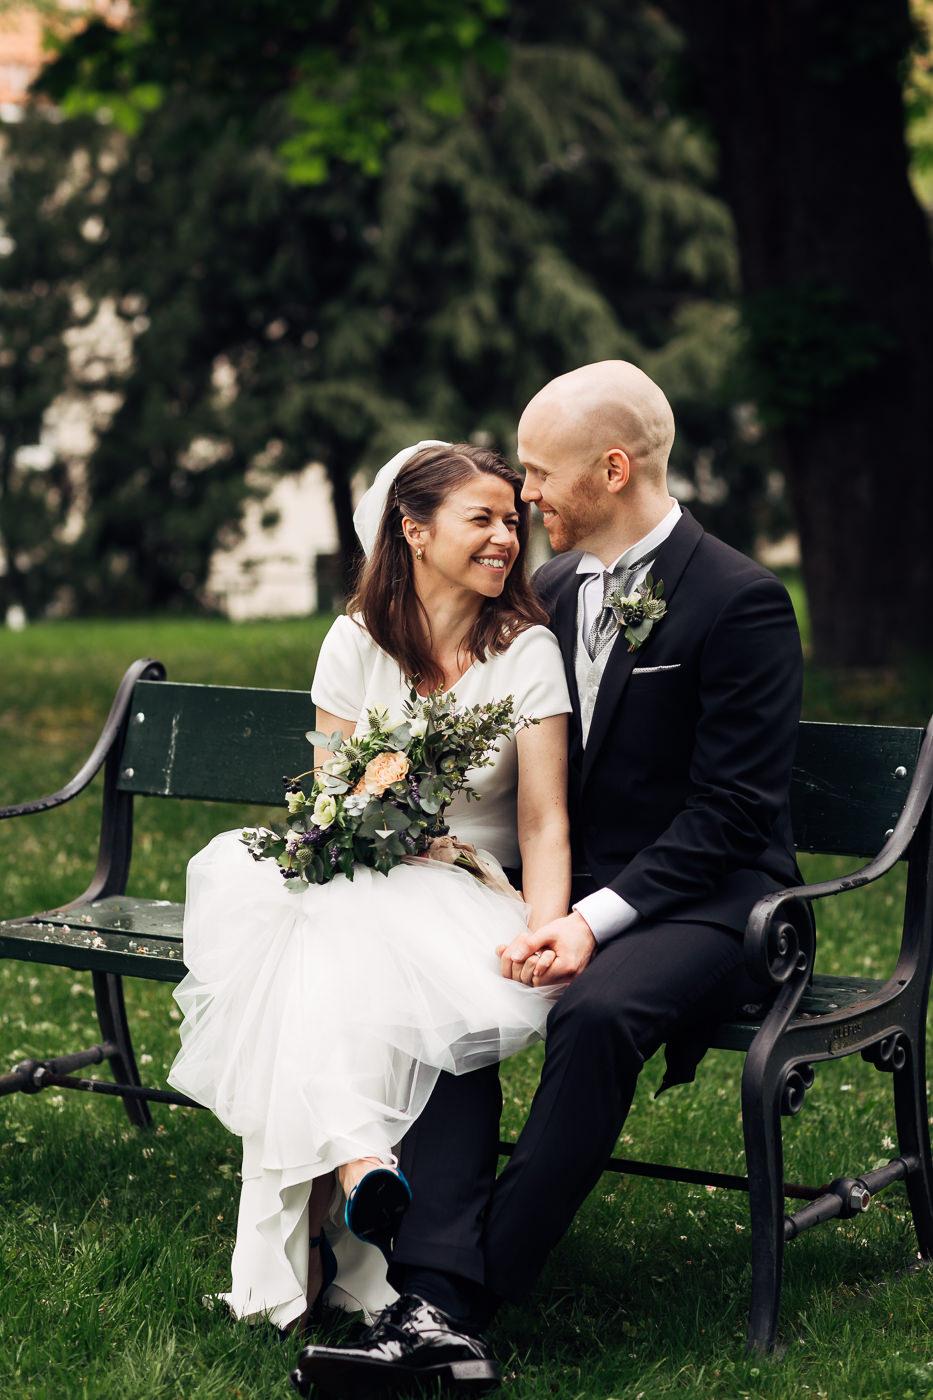 Malene & Ole Martin - elegant dansk- norskt bryllup i Oslo Bryllup Gamle Aker Oslo 38 Akershus